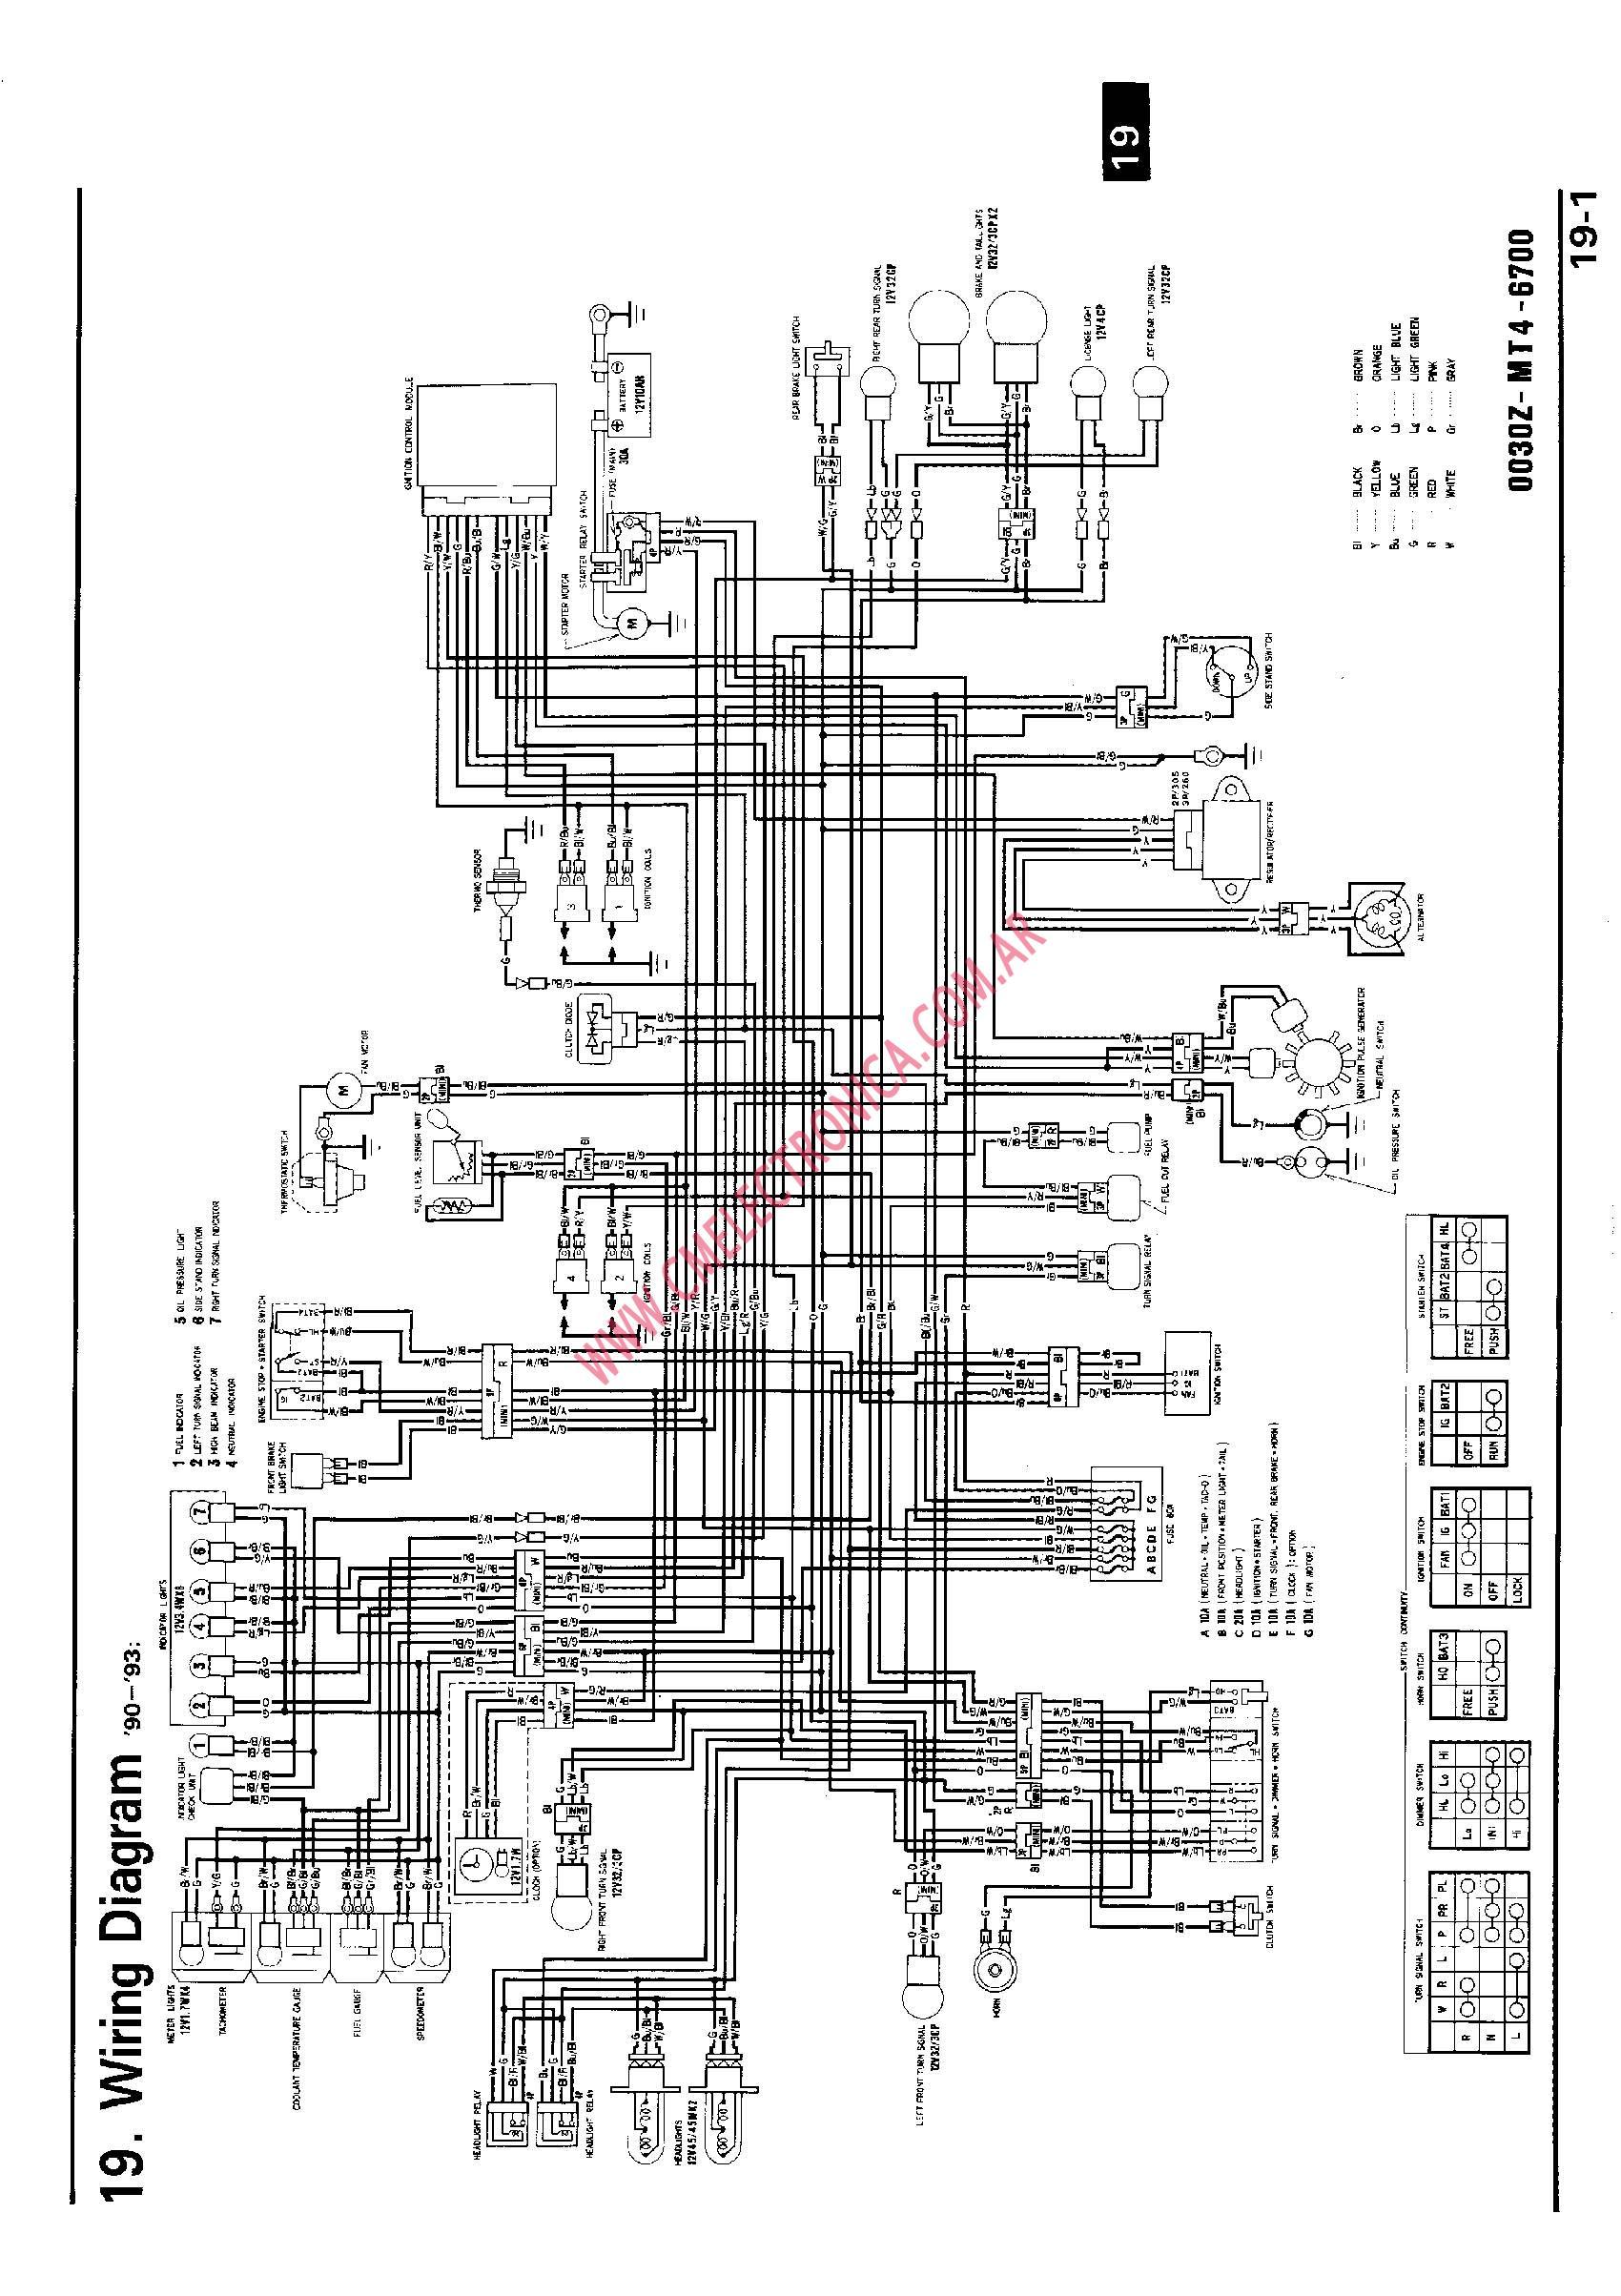 Outboard Wiring Diagram Honda Xl 250 Wiring Diagram Bmw Motorcycle